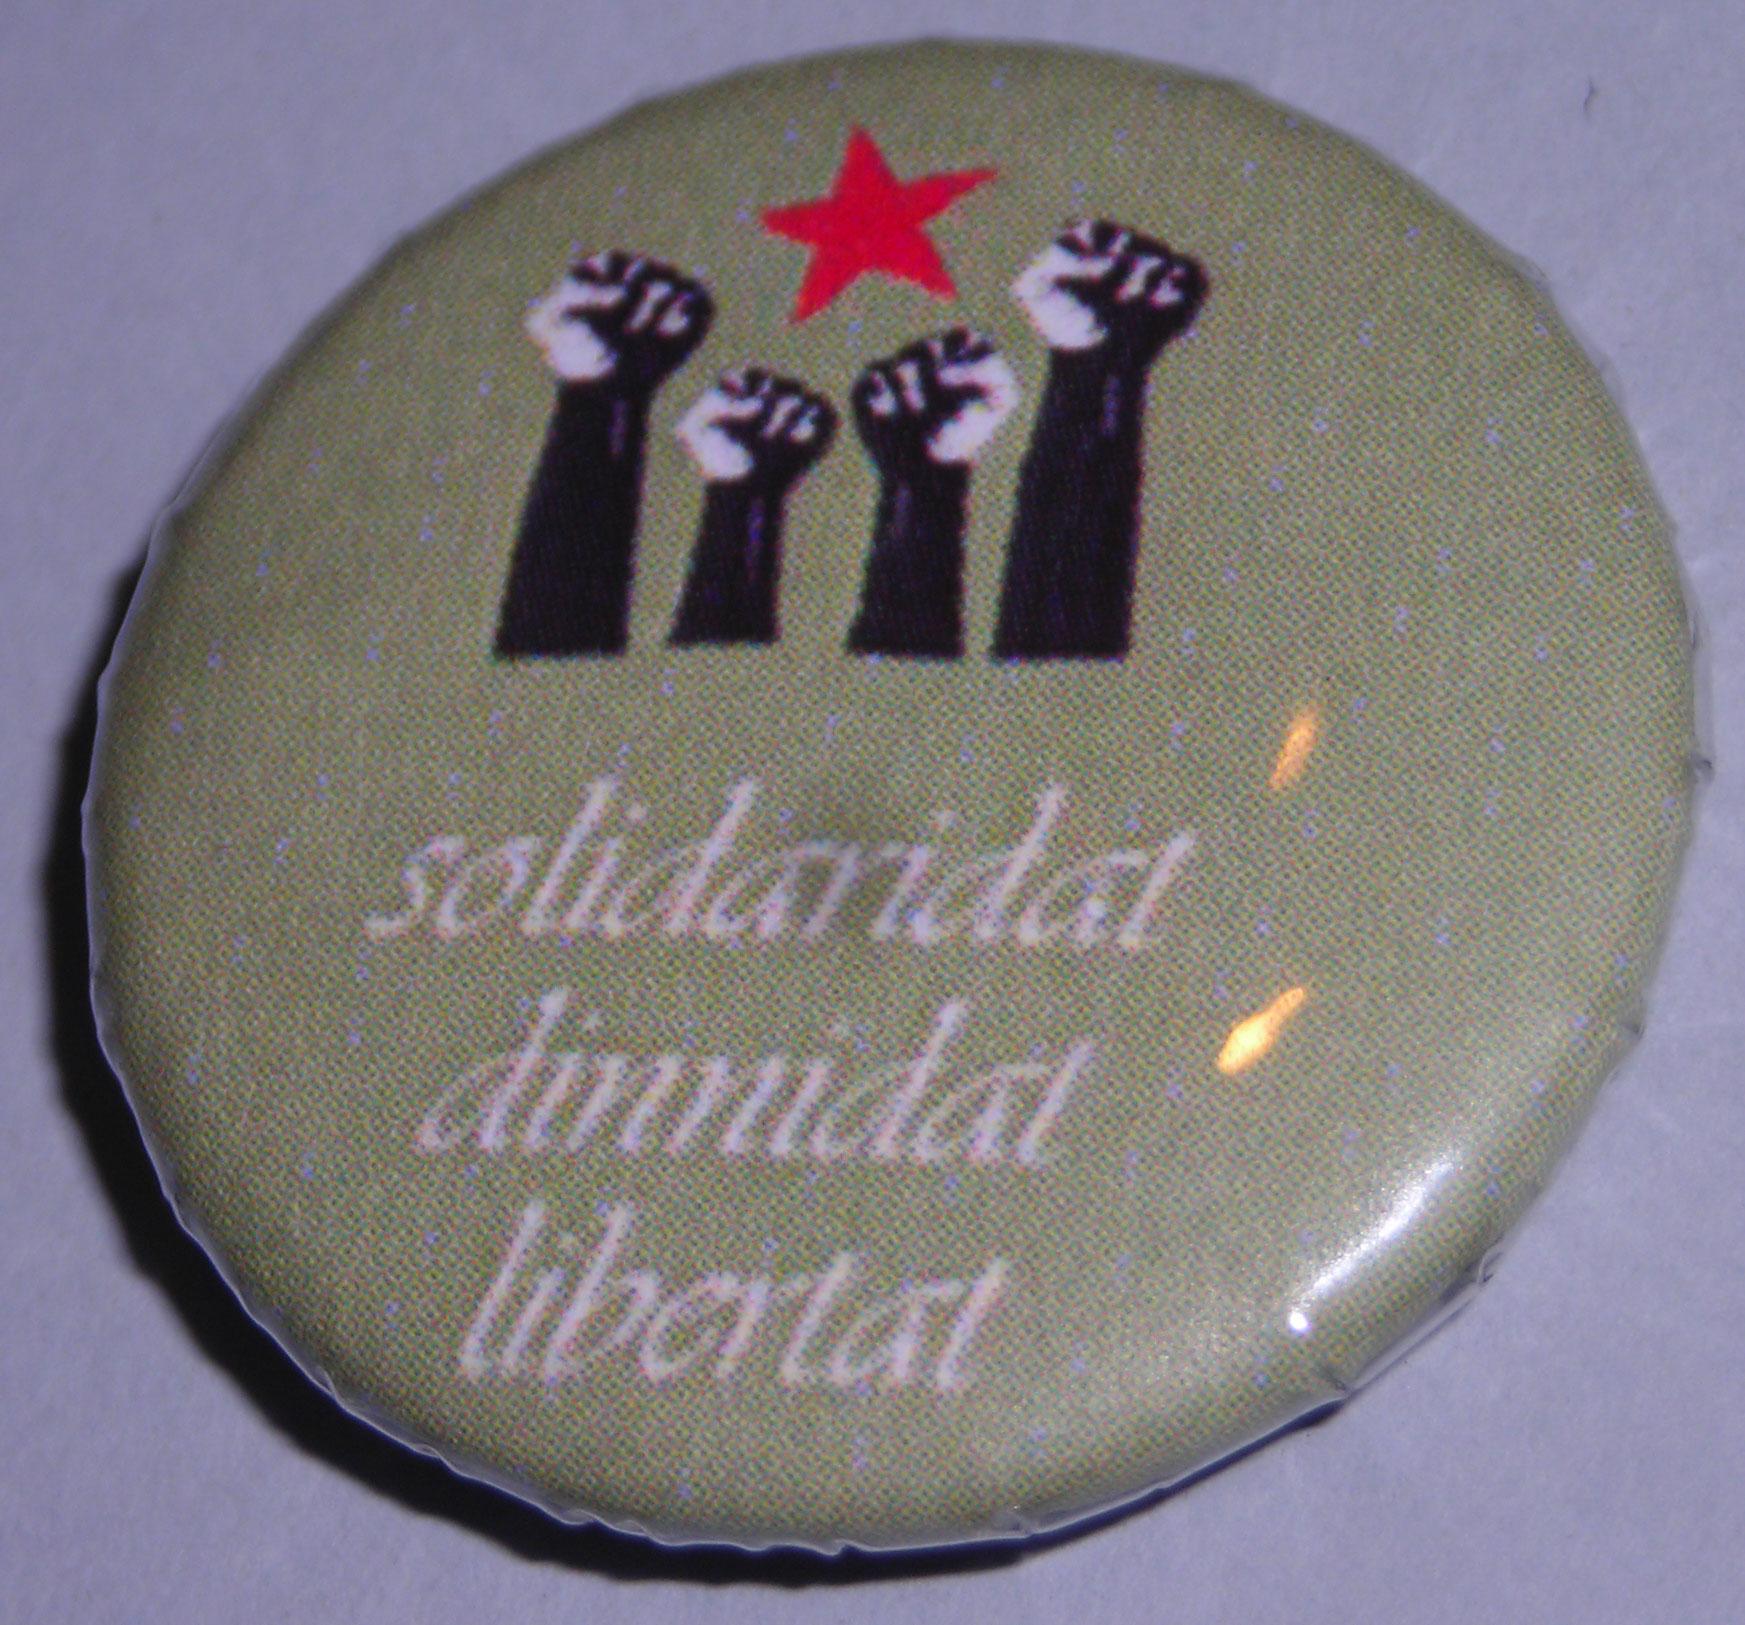 solidaridat-dinnidat-libertat